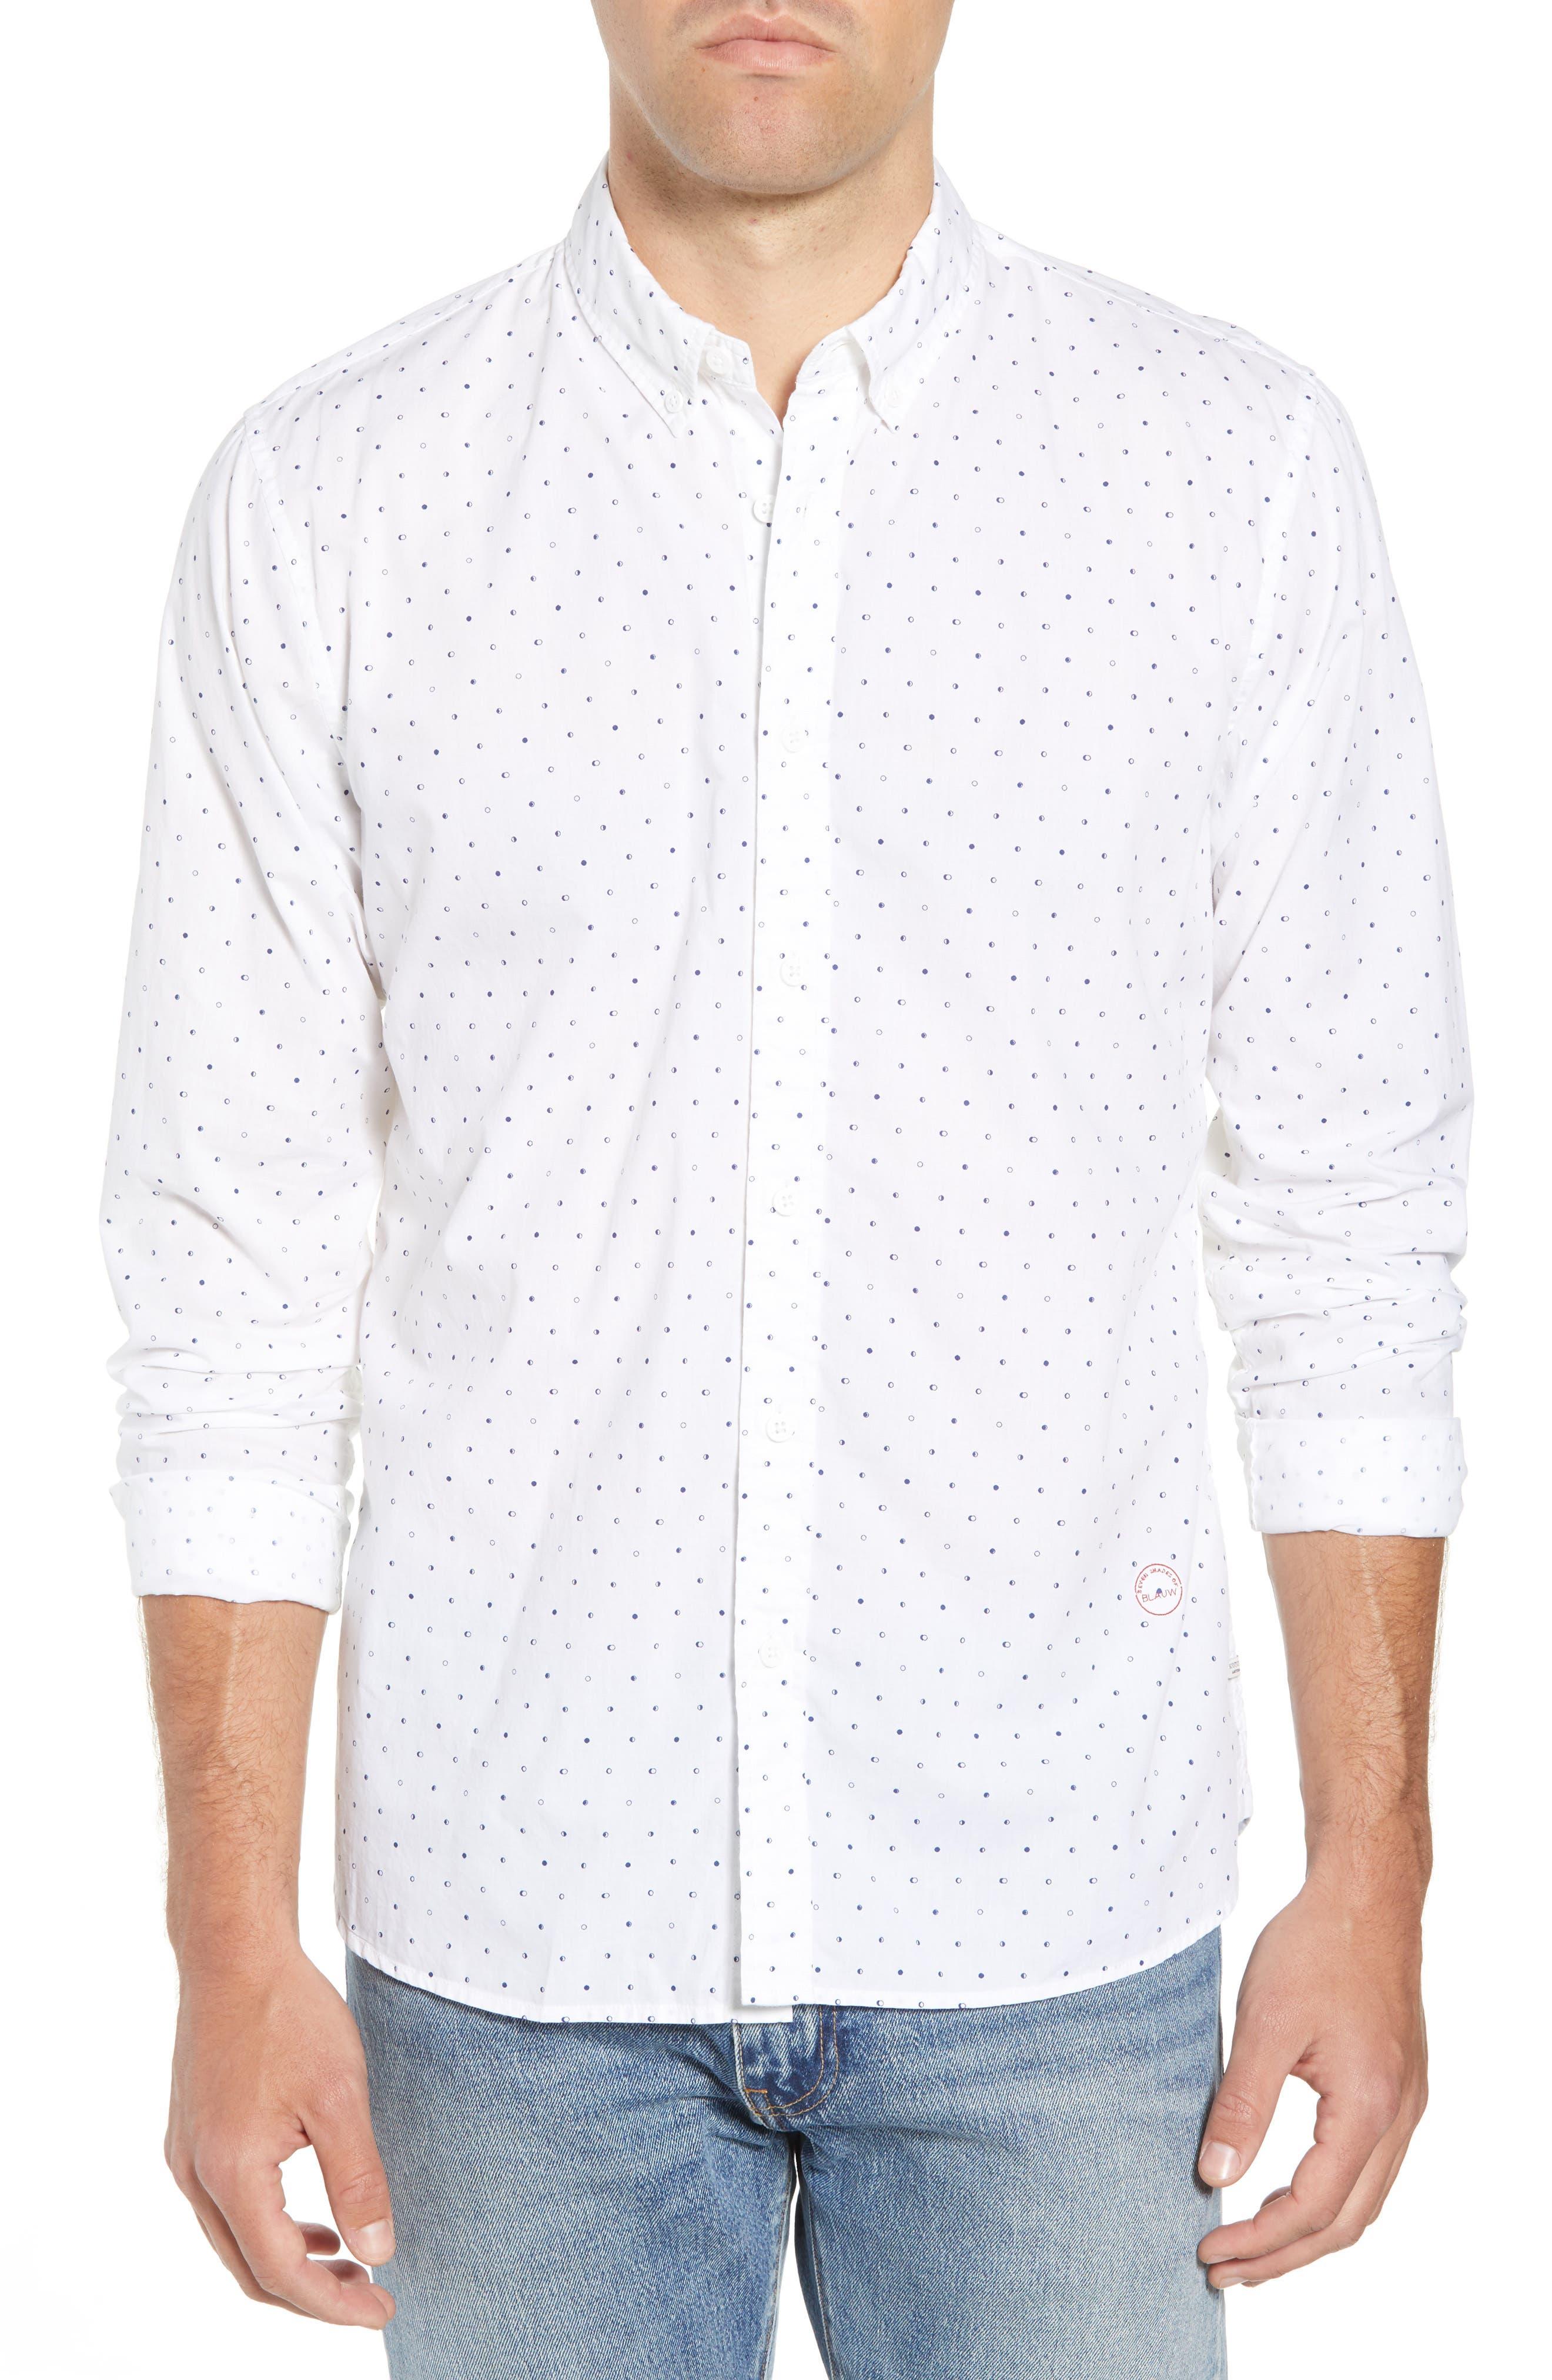 Amsterdams Blauw Simple Light Print Sport Shirt,                         Main,                         color, 110